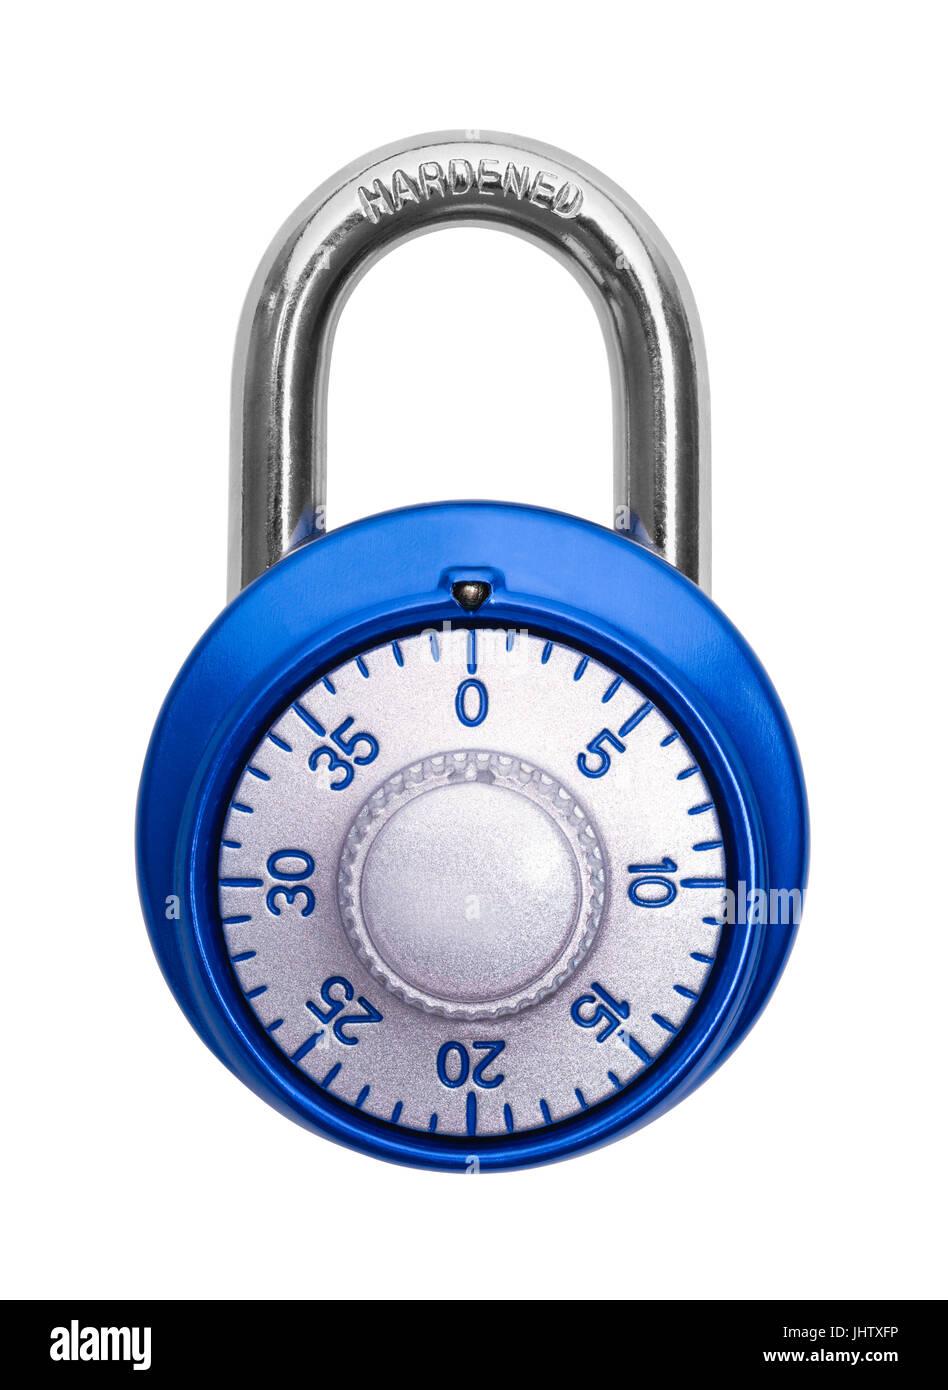 Closed Blue Combination Lock Isolated on White Background. - Stock Image